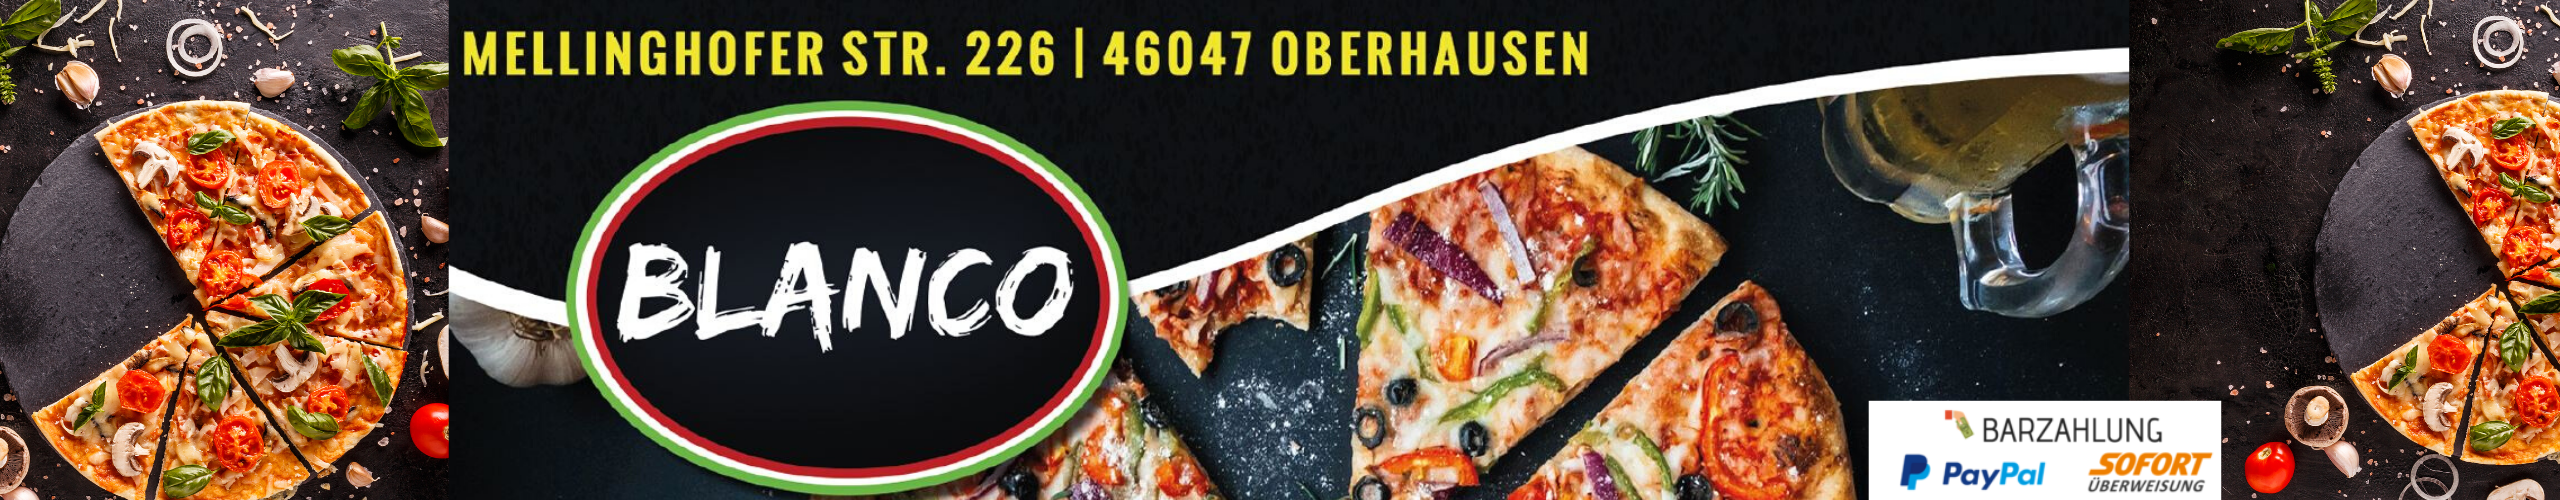 Pizzeria Blanco Oberhausen | -20 Prozent Rabatt auf alles!